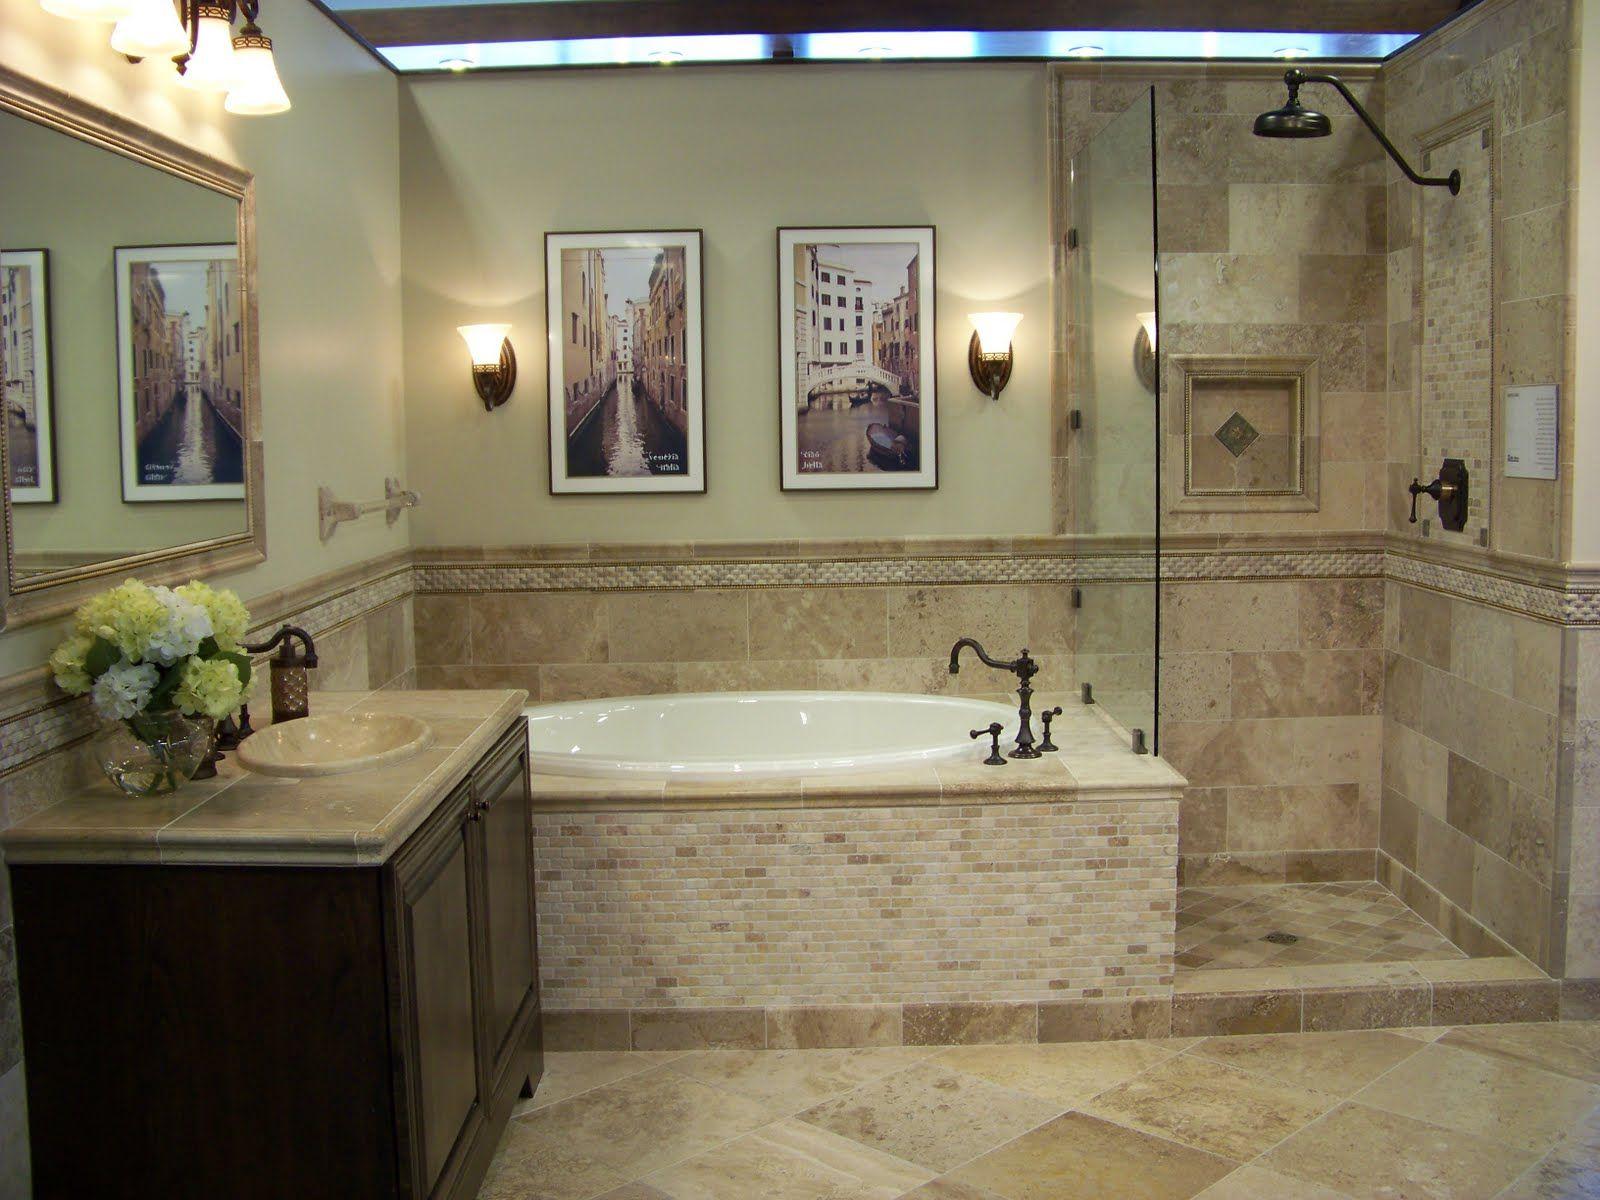 Home Decor Budgetista: Bathroom Inspiration - The Tile Shop ...